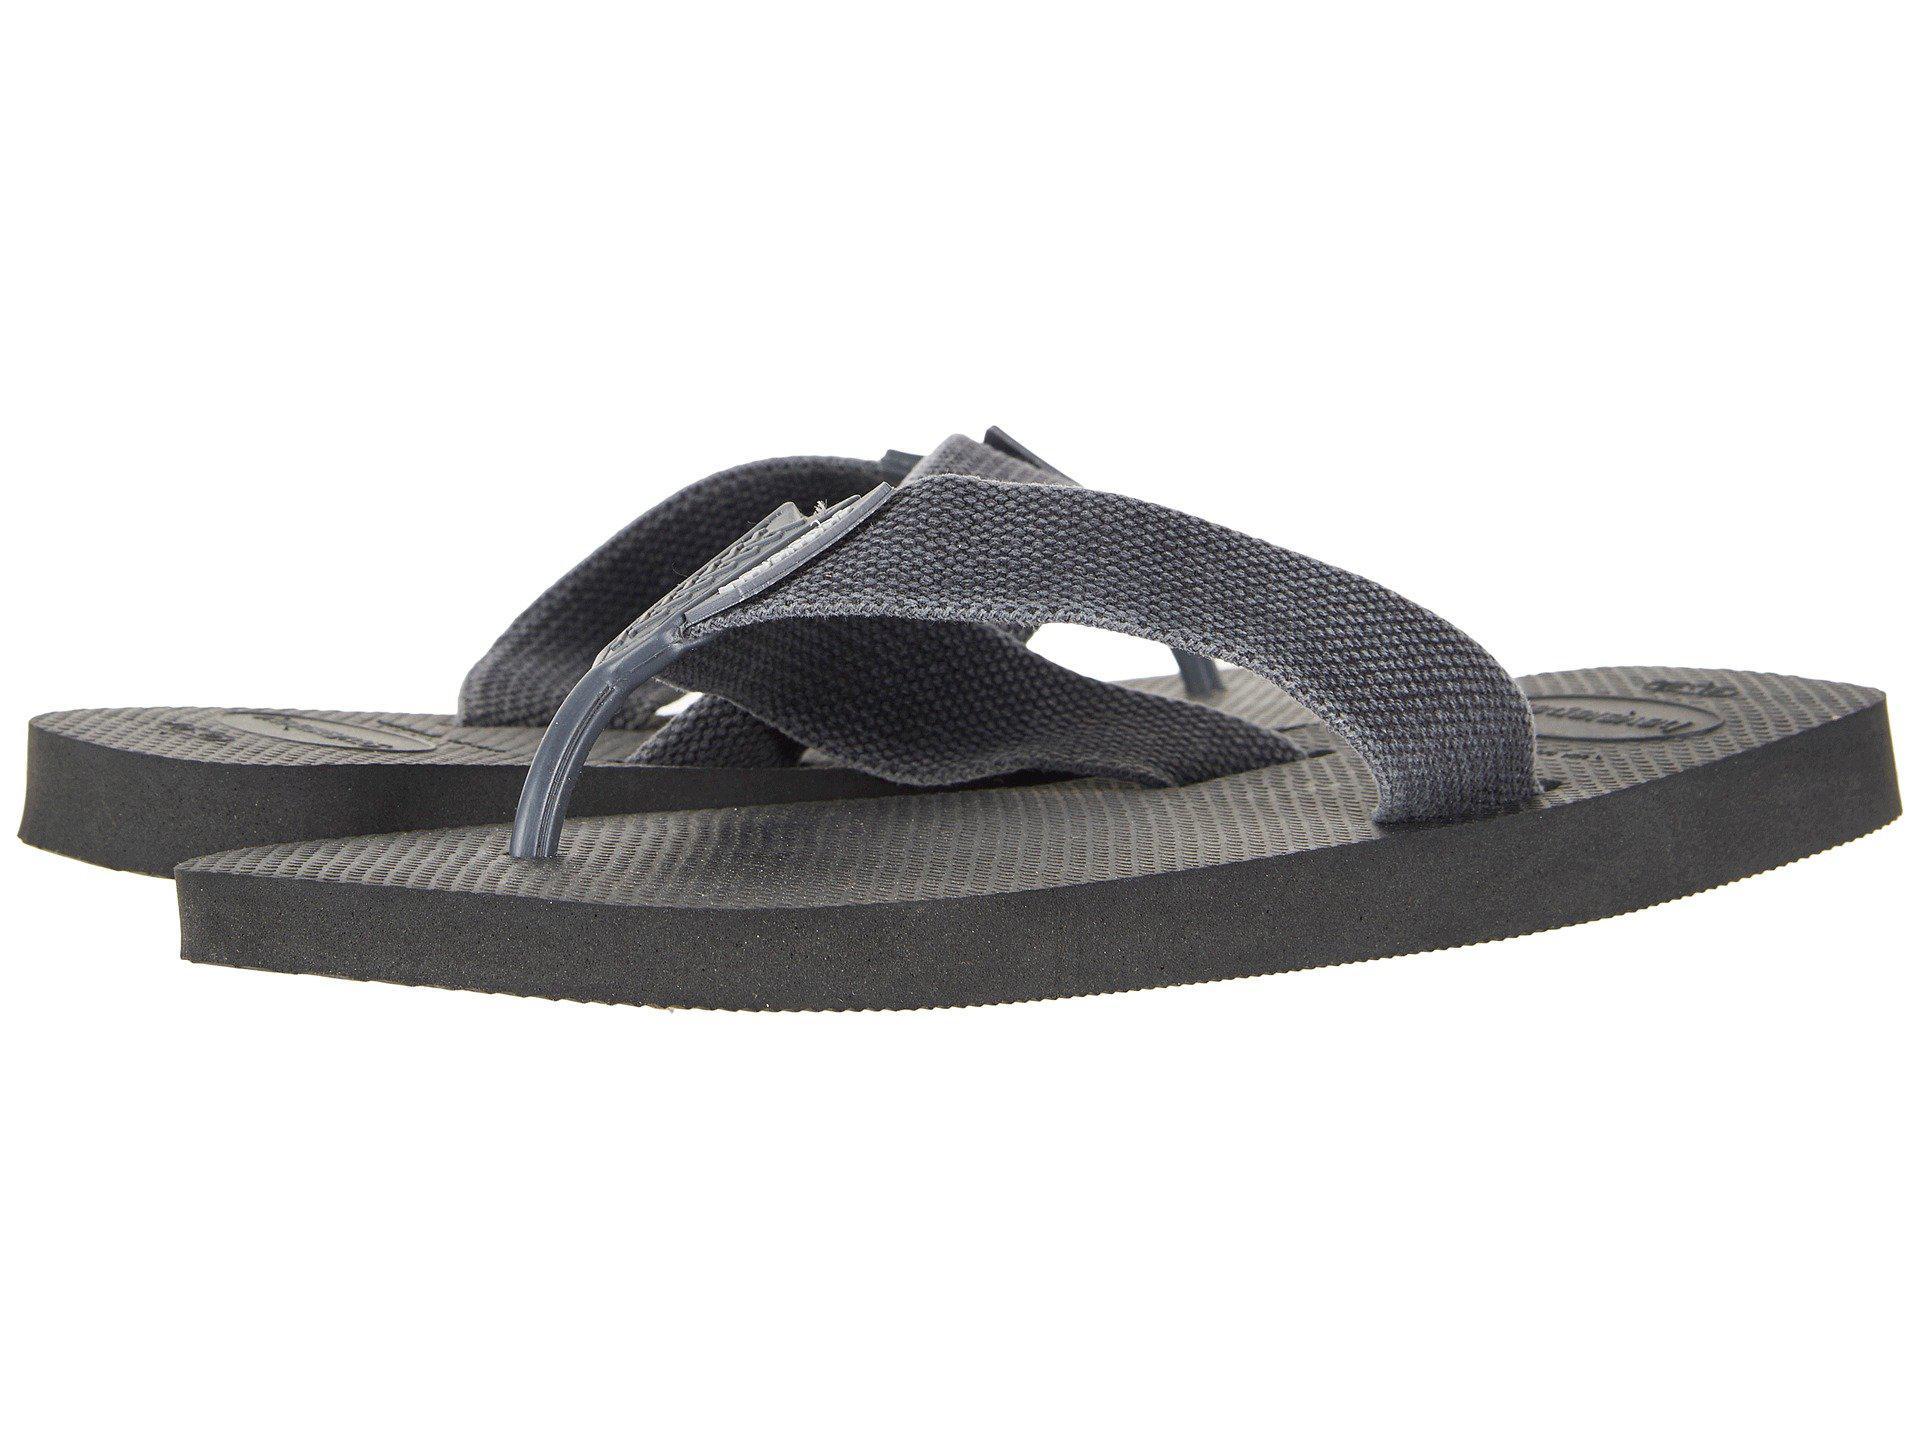 ed23ff1e3309a Lyst - Havaianas Urban Basic Flip Flops (black grey) Men s Sandals ...